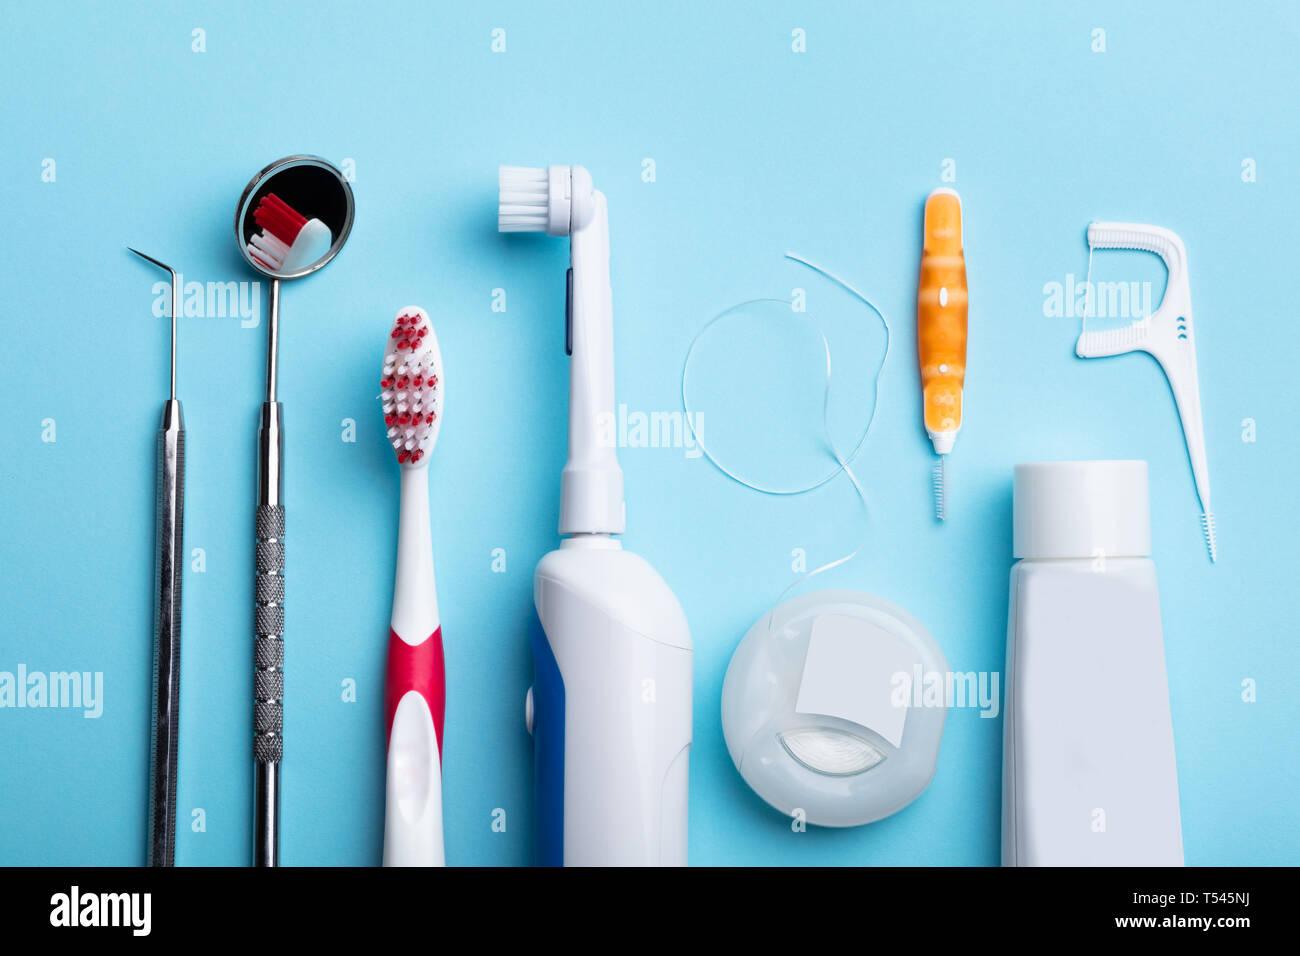 Dental Instrument Stock Photos & Dental Instrument Stock